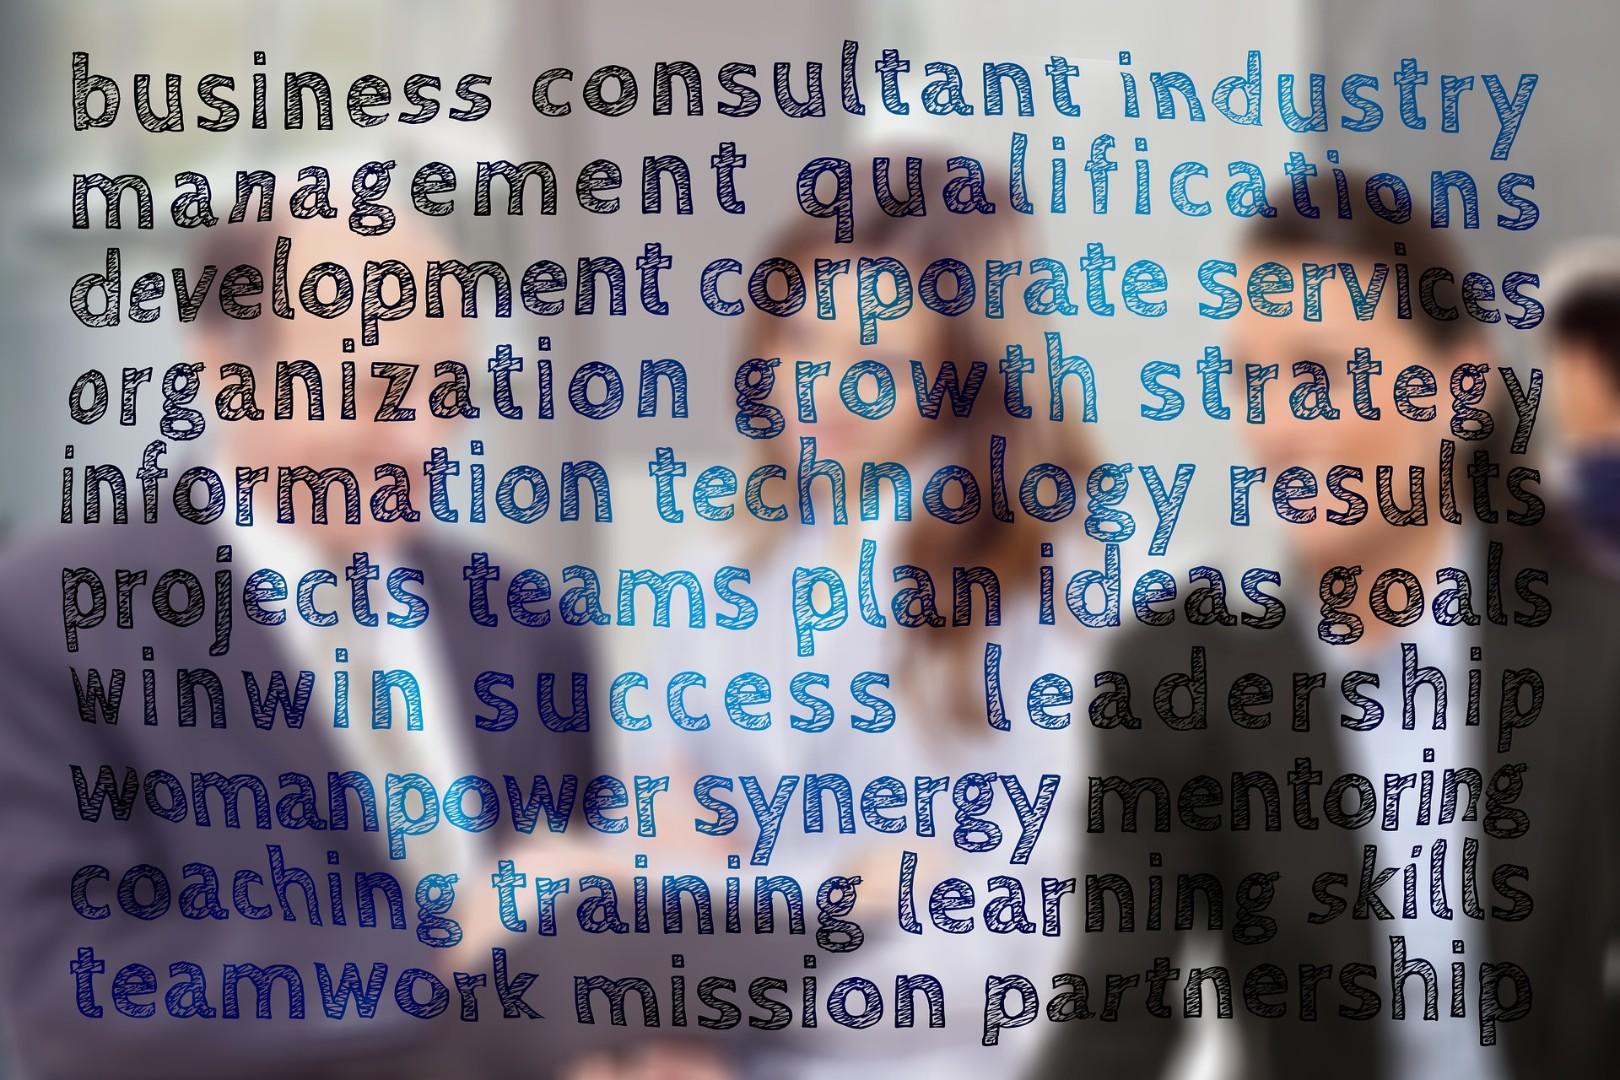 business-2042282_1920.jpg